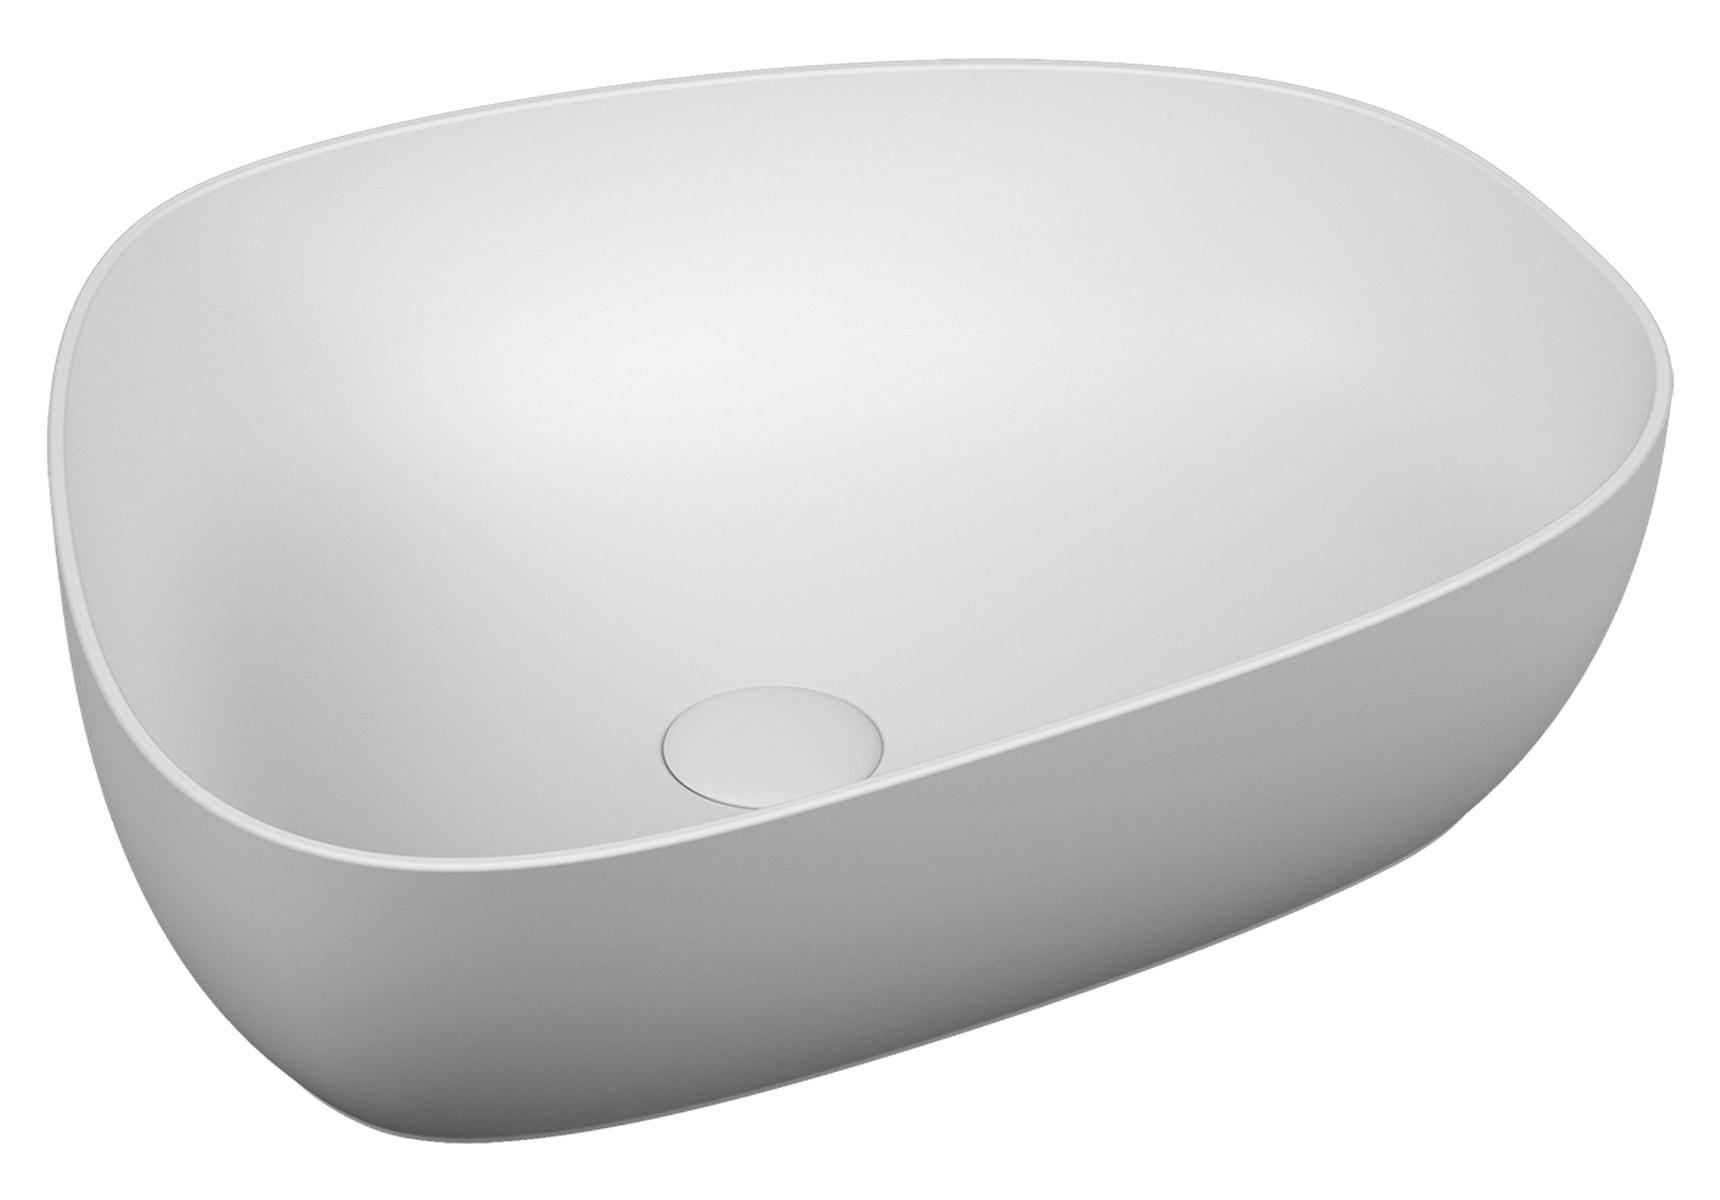 Outline Pebble Bowl Washbasin